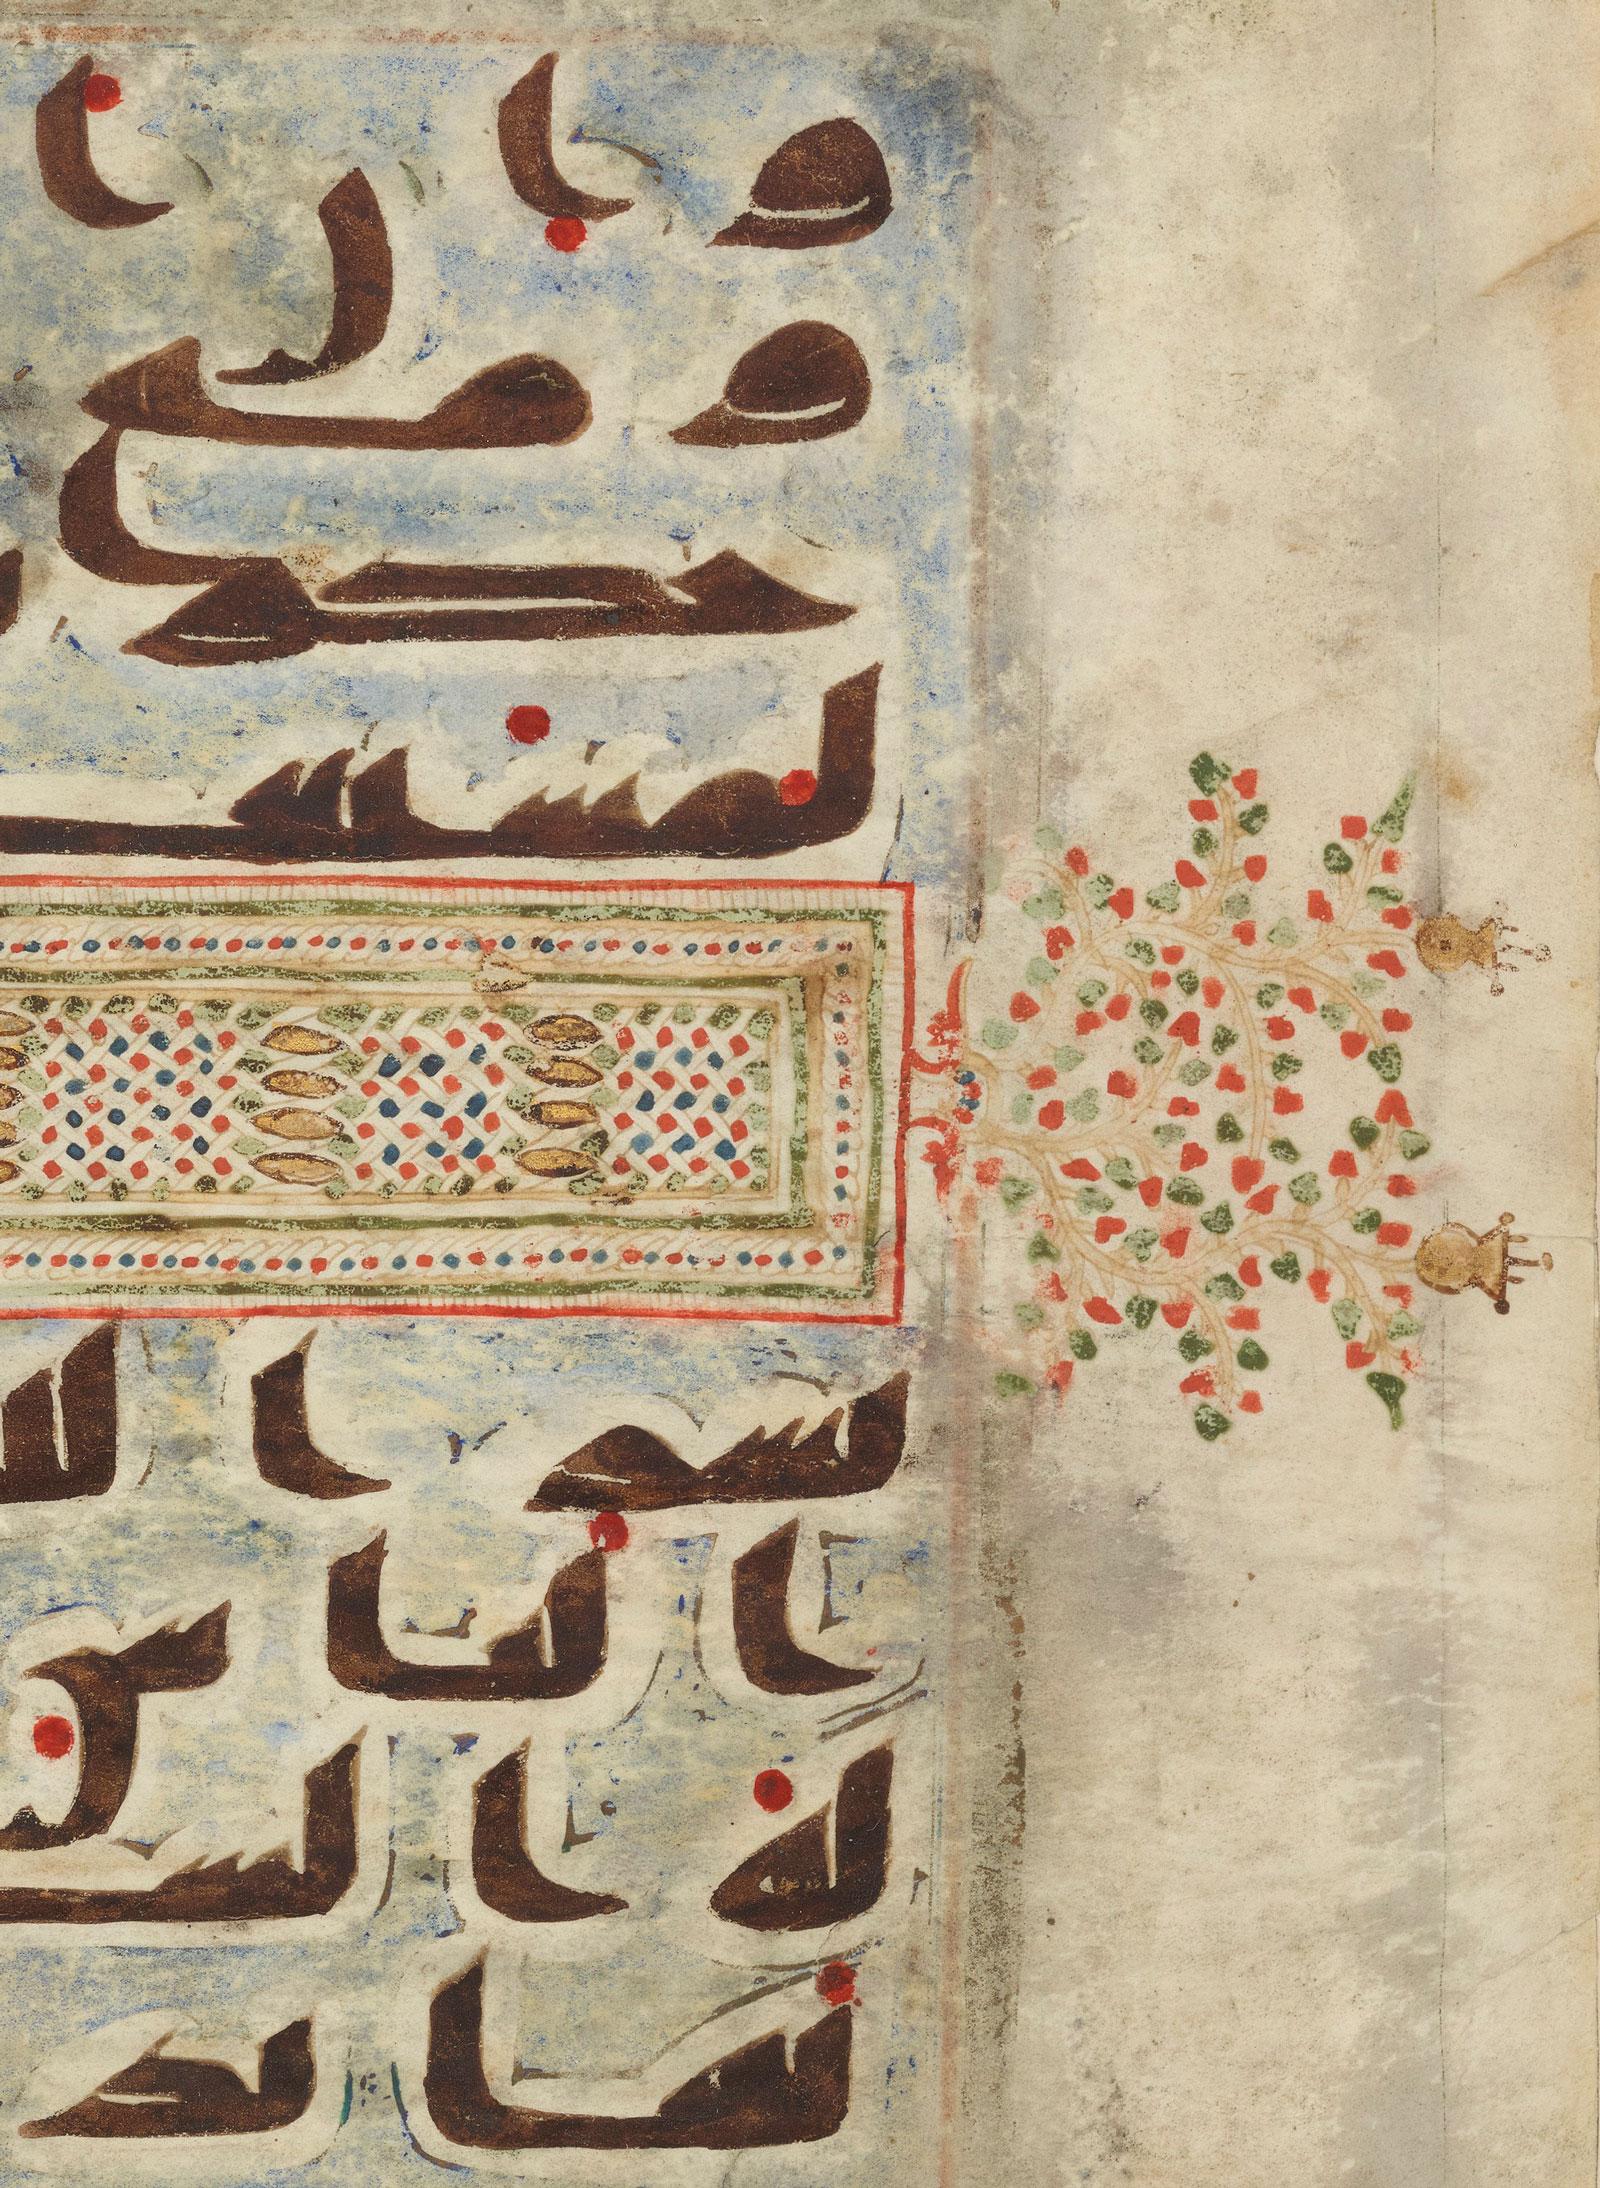 Detail from a Koran, Near East, Abbasid period, ninth century